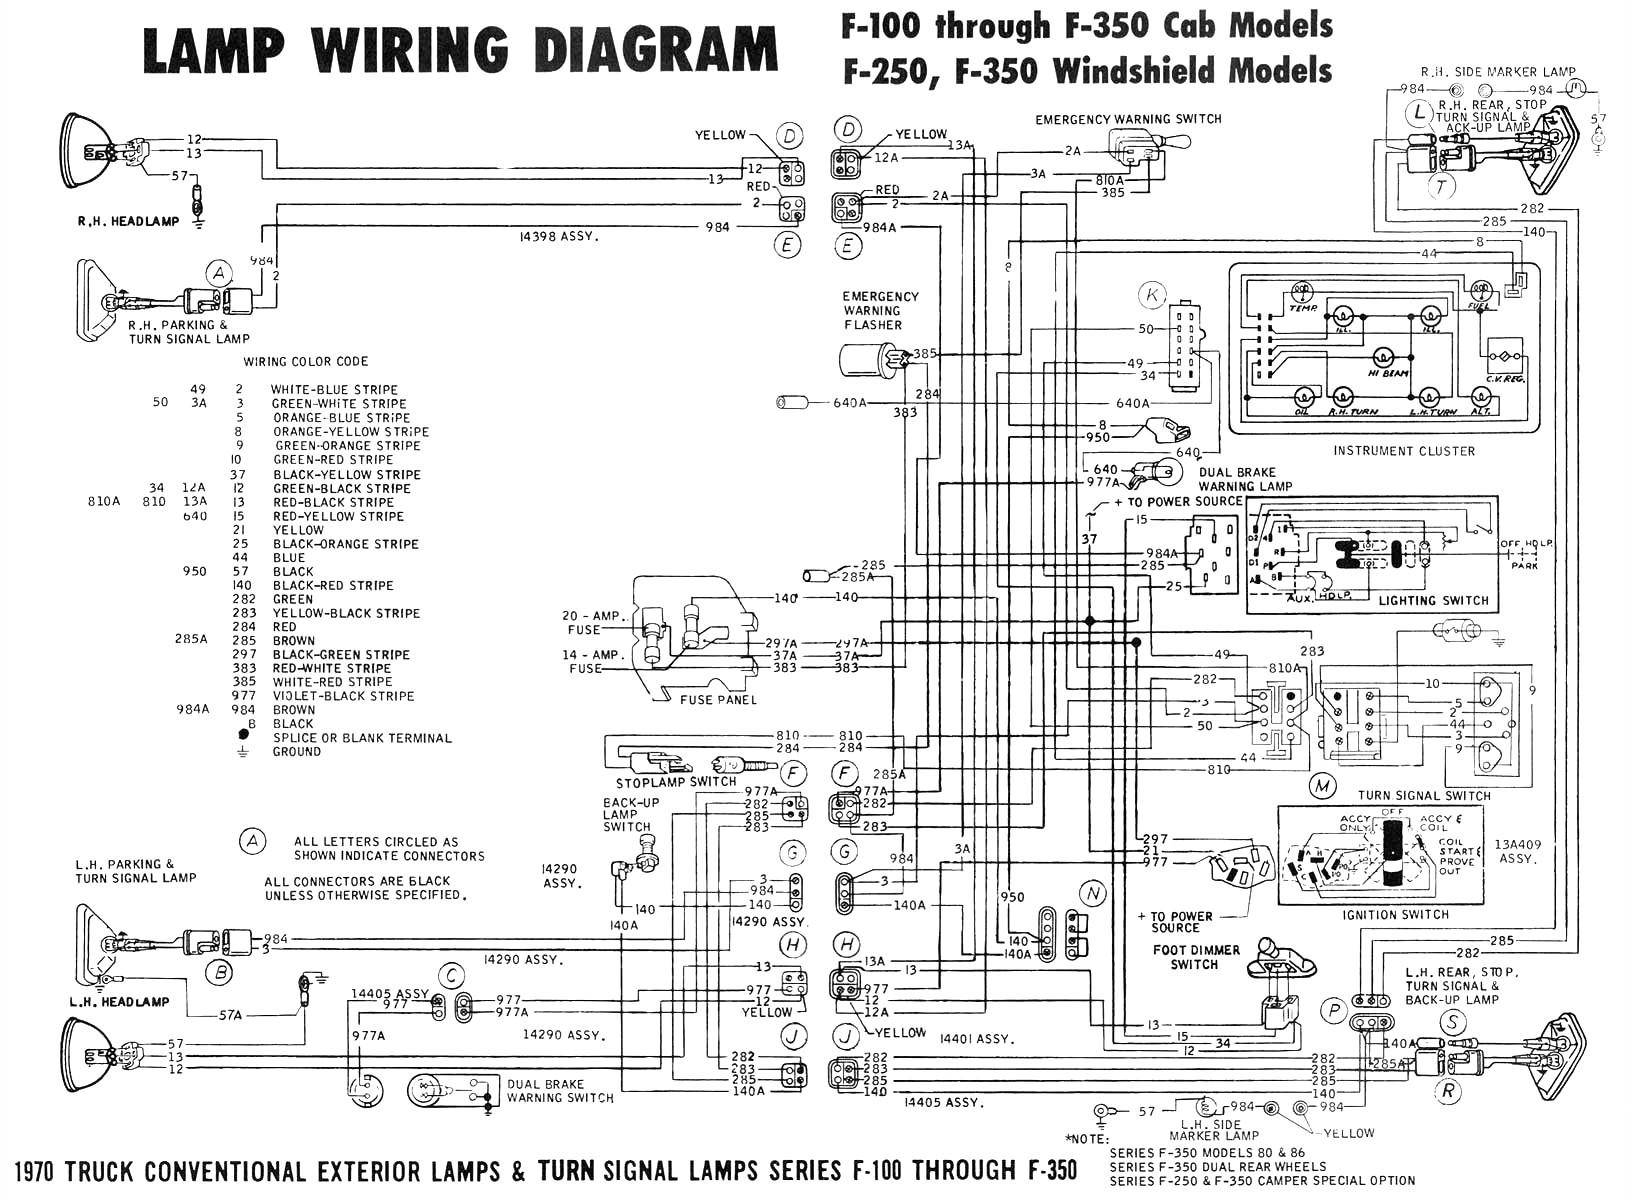 fuse box diagram f250 2015 wiring diagram img 2005 dodge caravan wiring diagram free picture